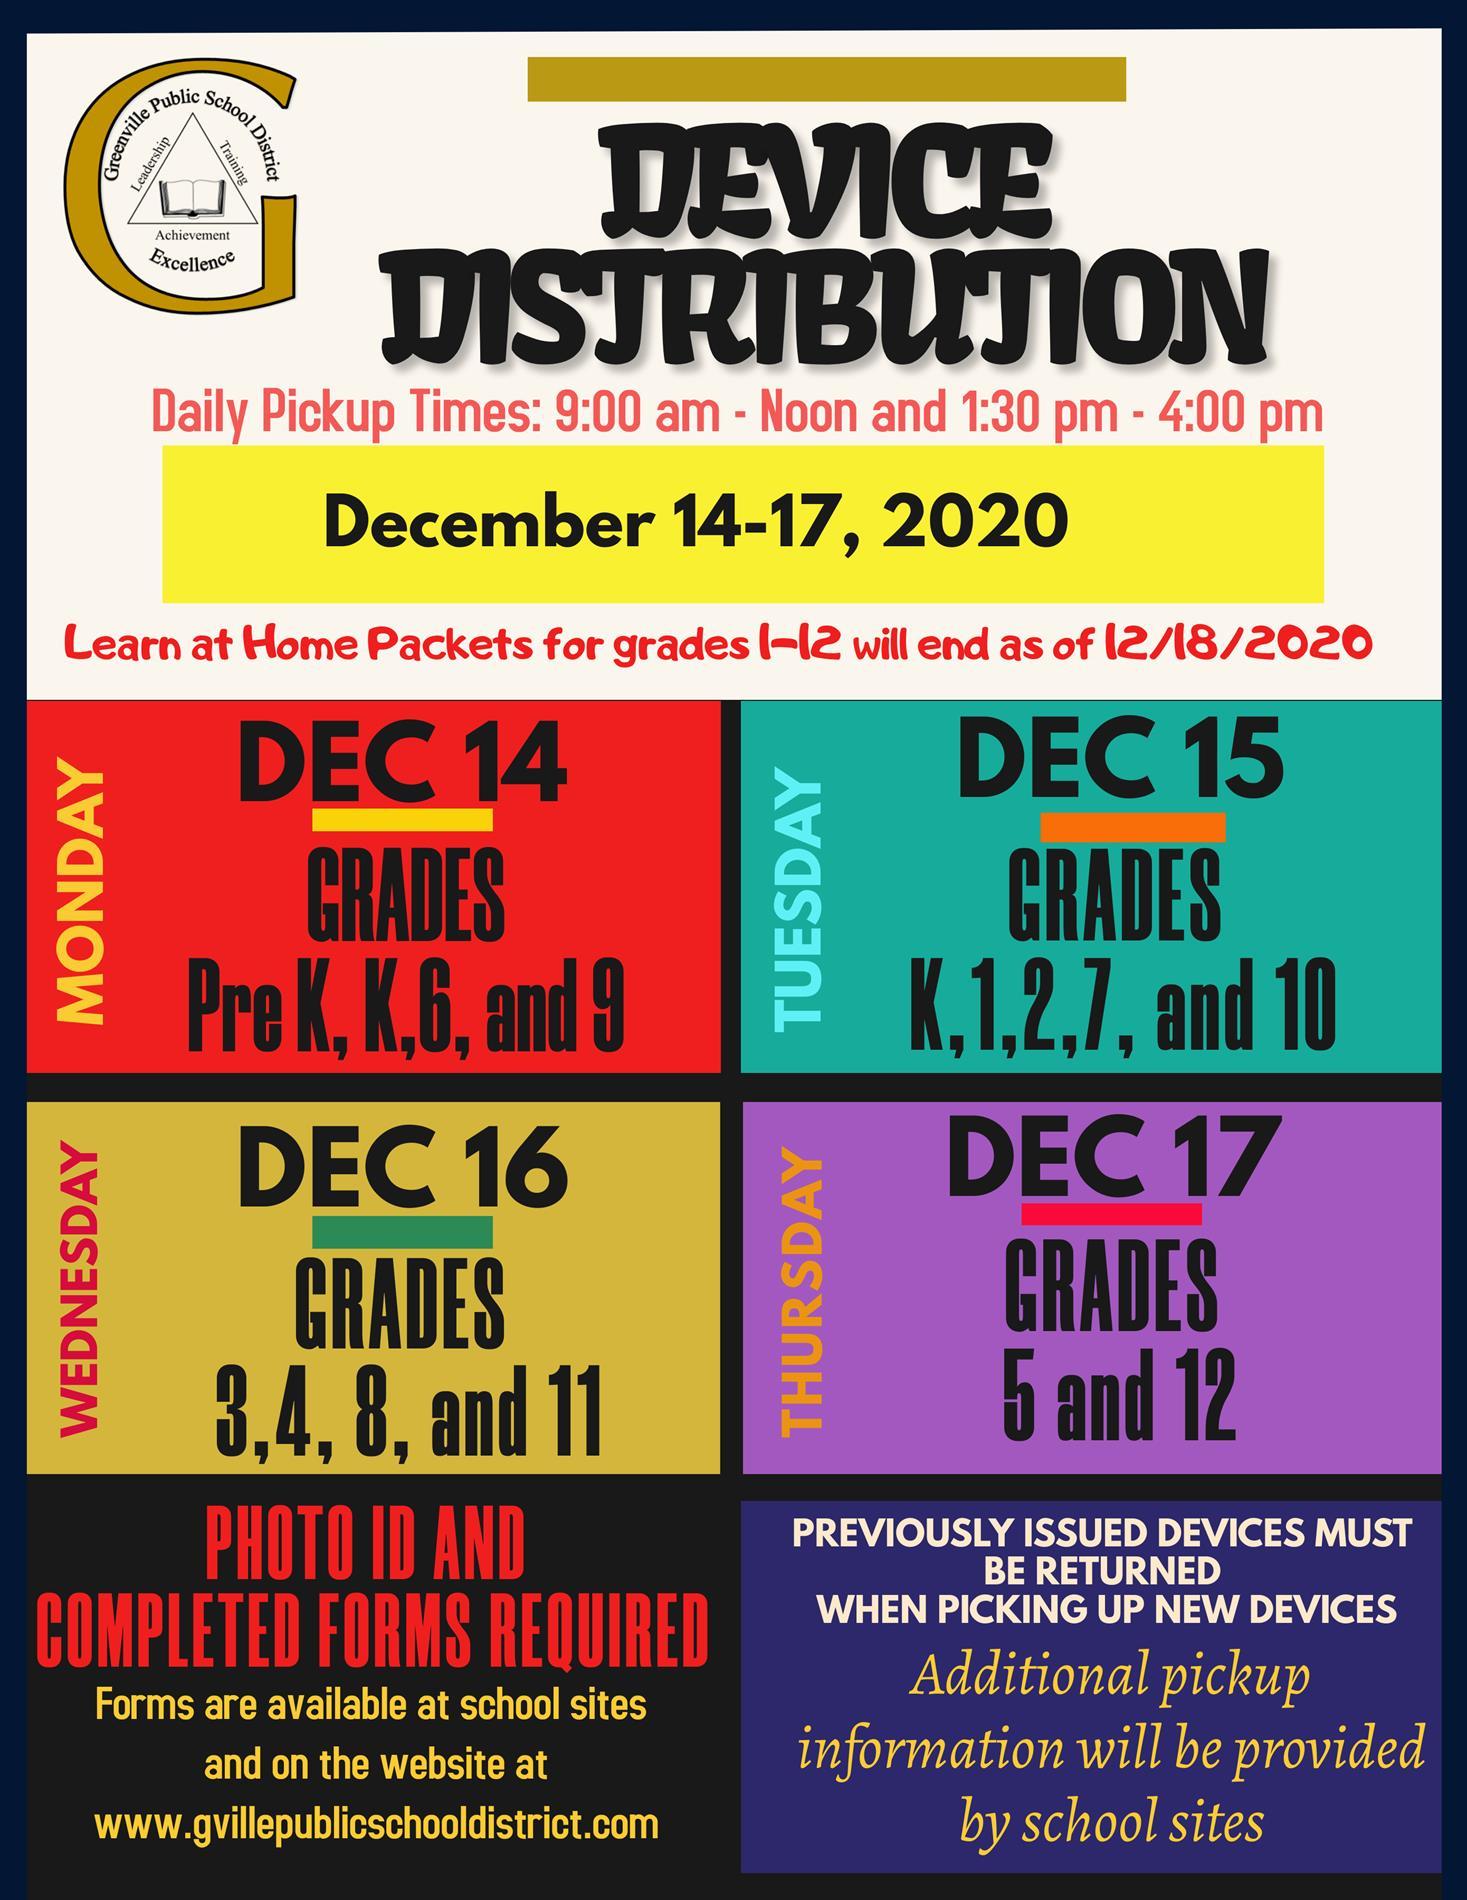 Device Distribution